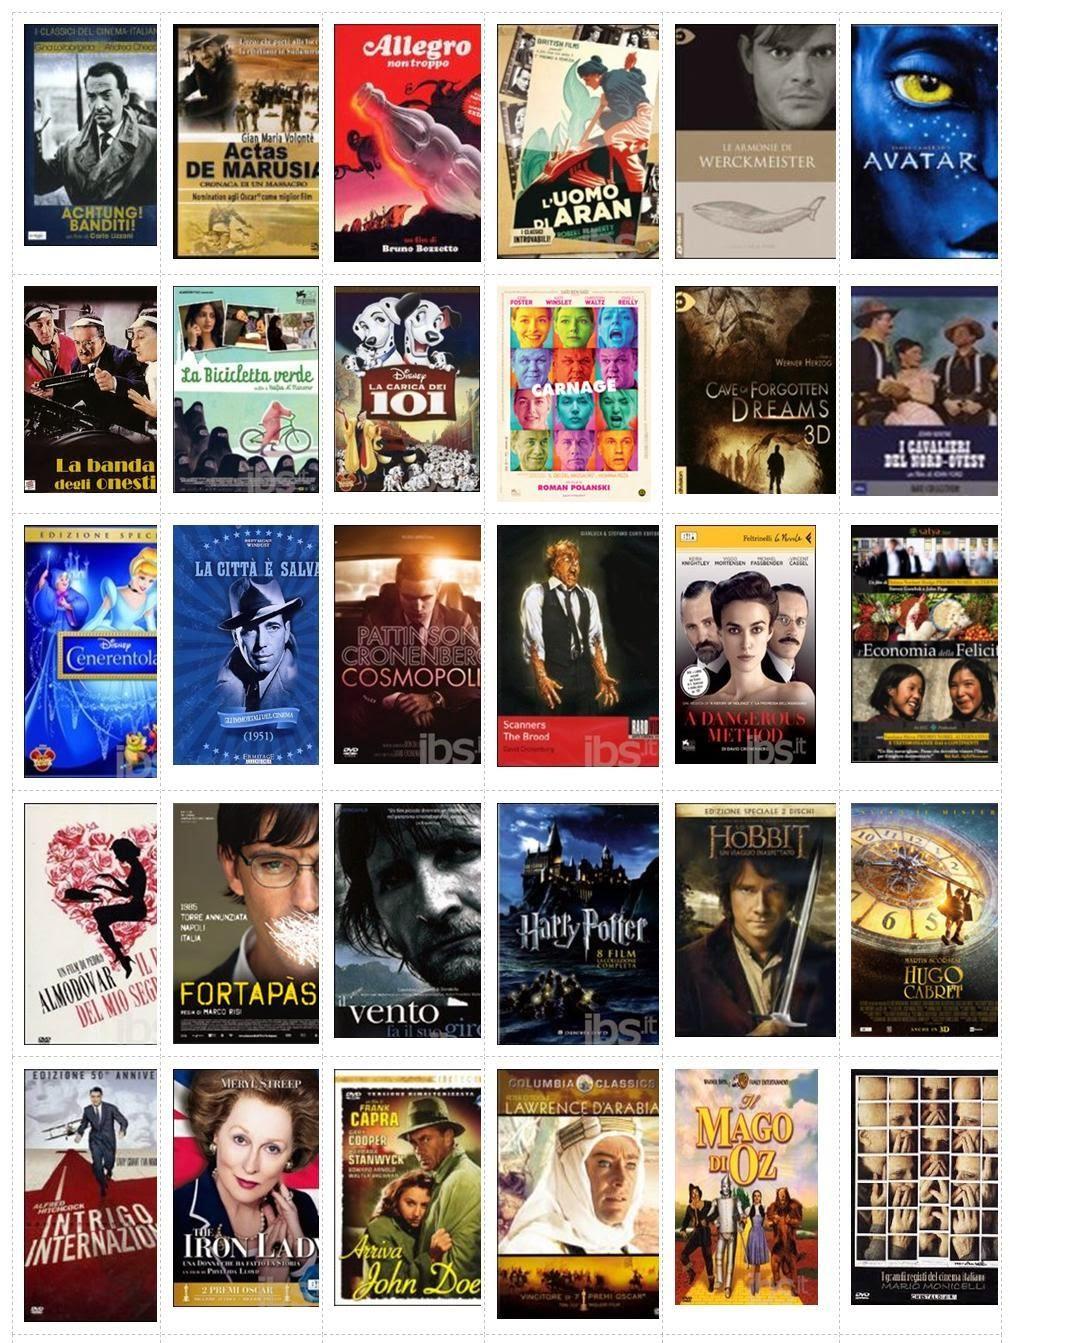 Elenco nuovi film 2015